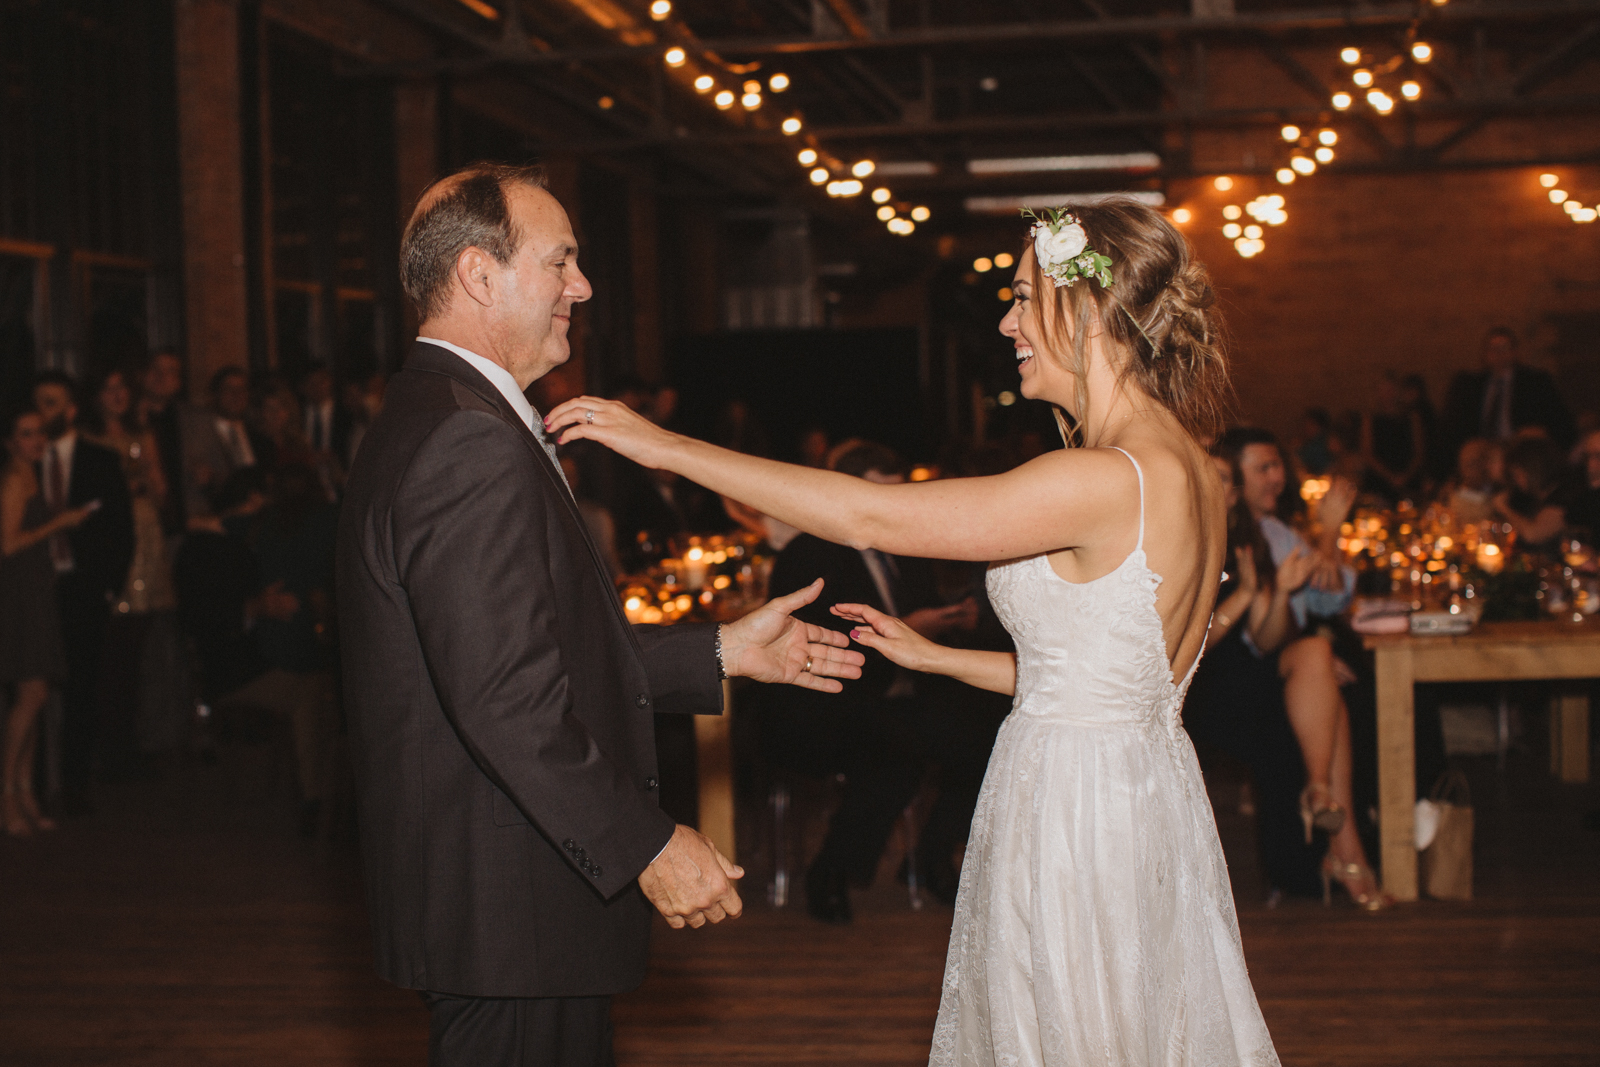 BeanandCole.com-Chris&JackieJohnson-Wedding-287.jpg